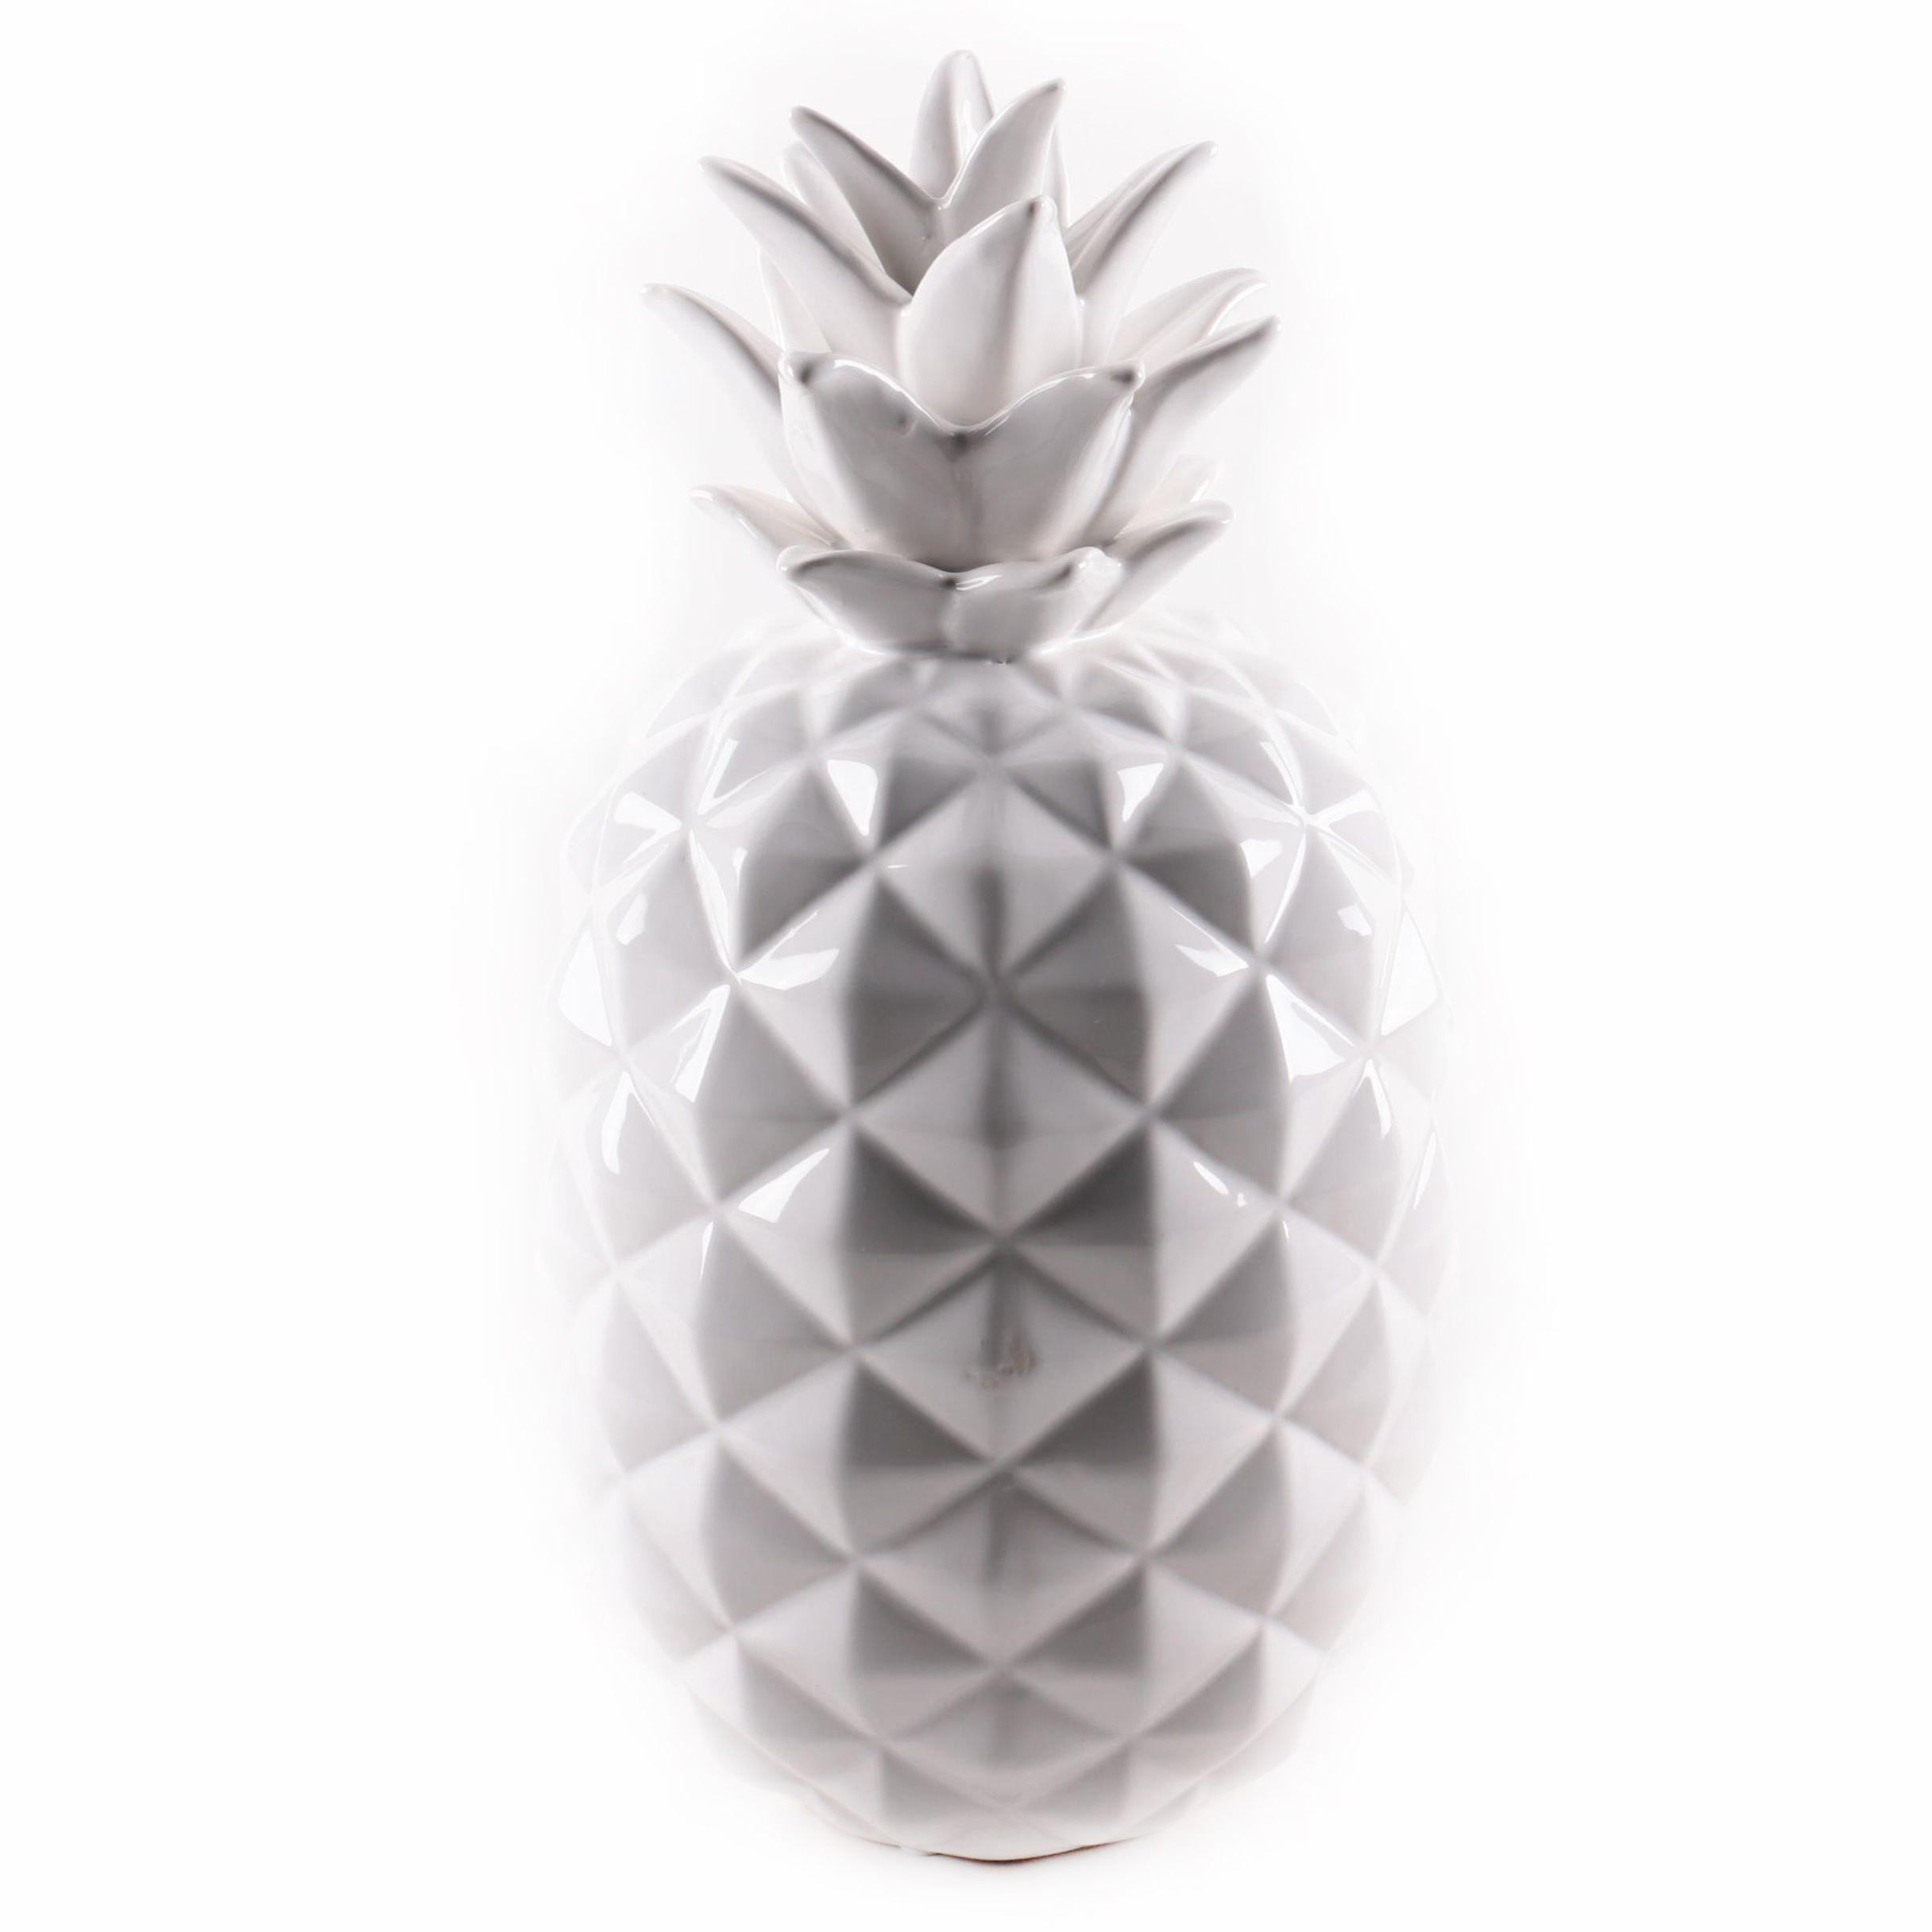 Glazed White Ceramic Decorative Pineapple